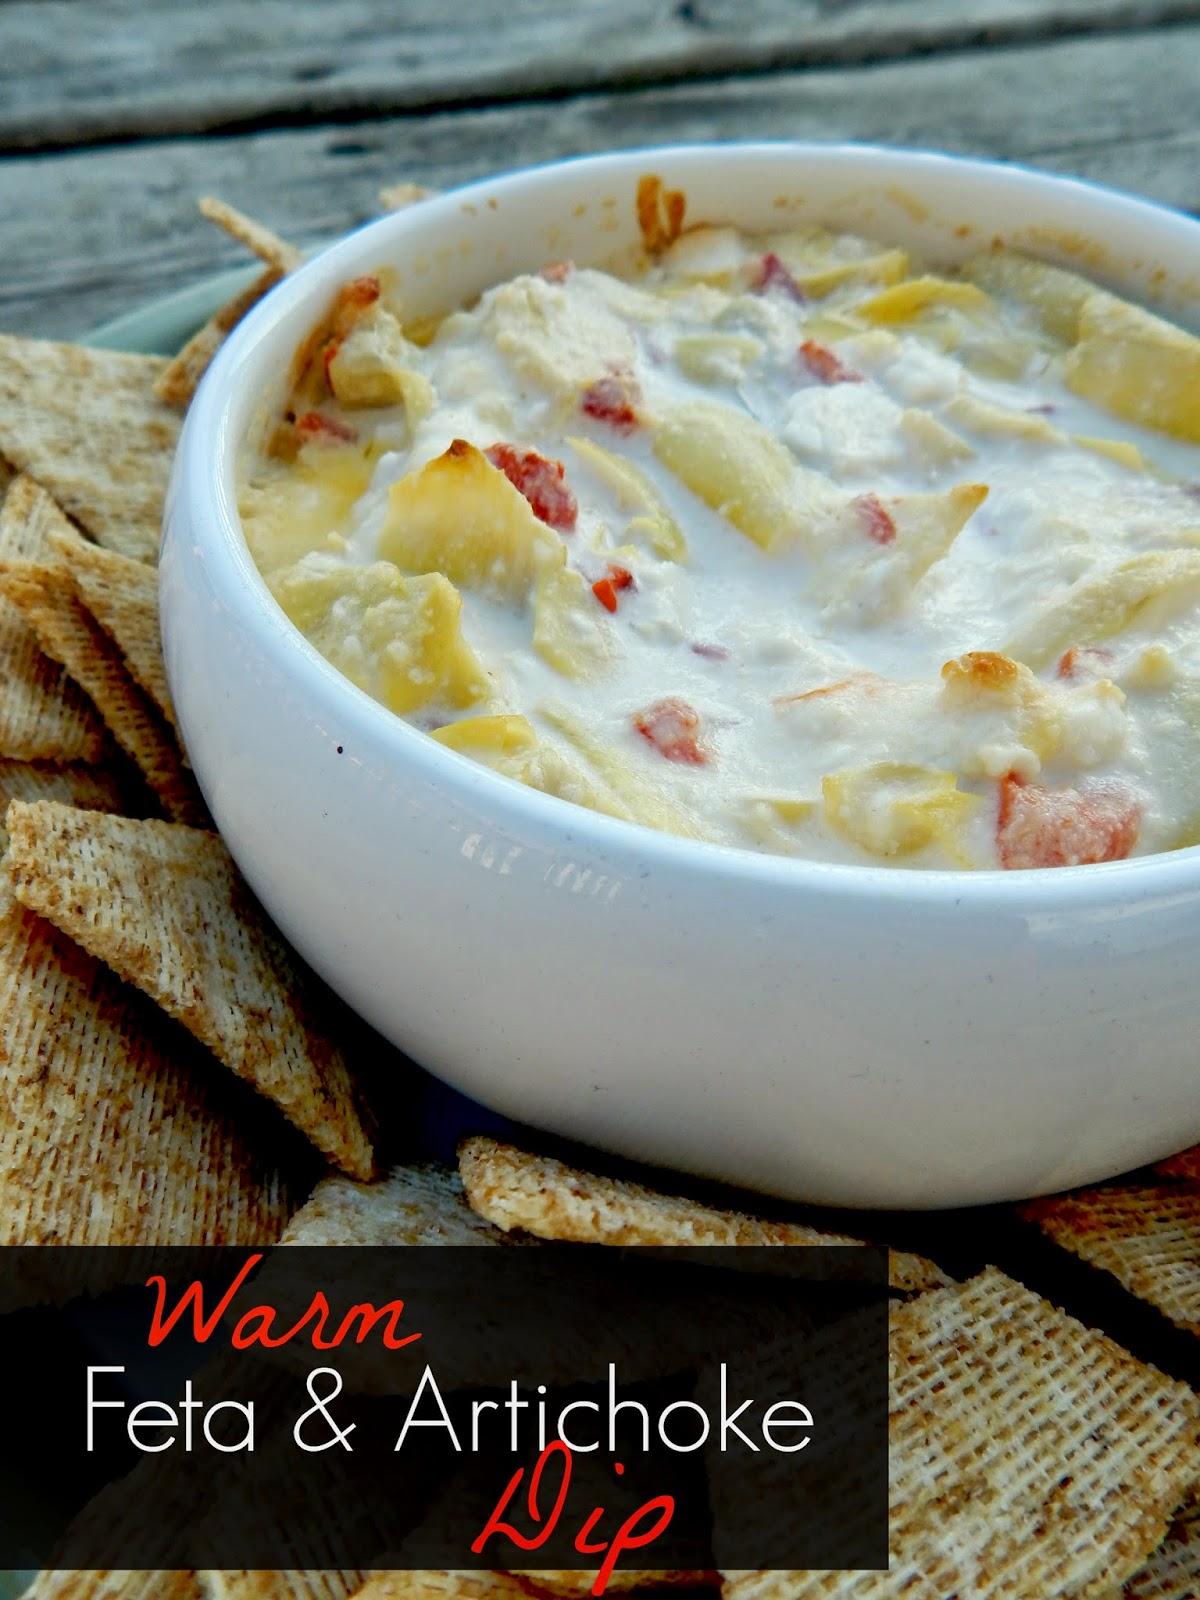 warm feta & artichoke dip (swetandsavoryfood.com)